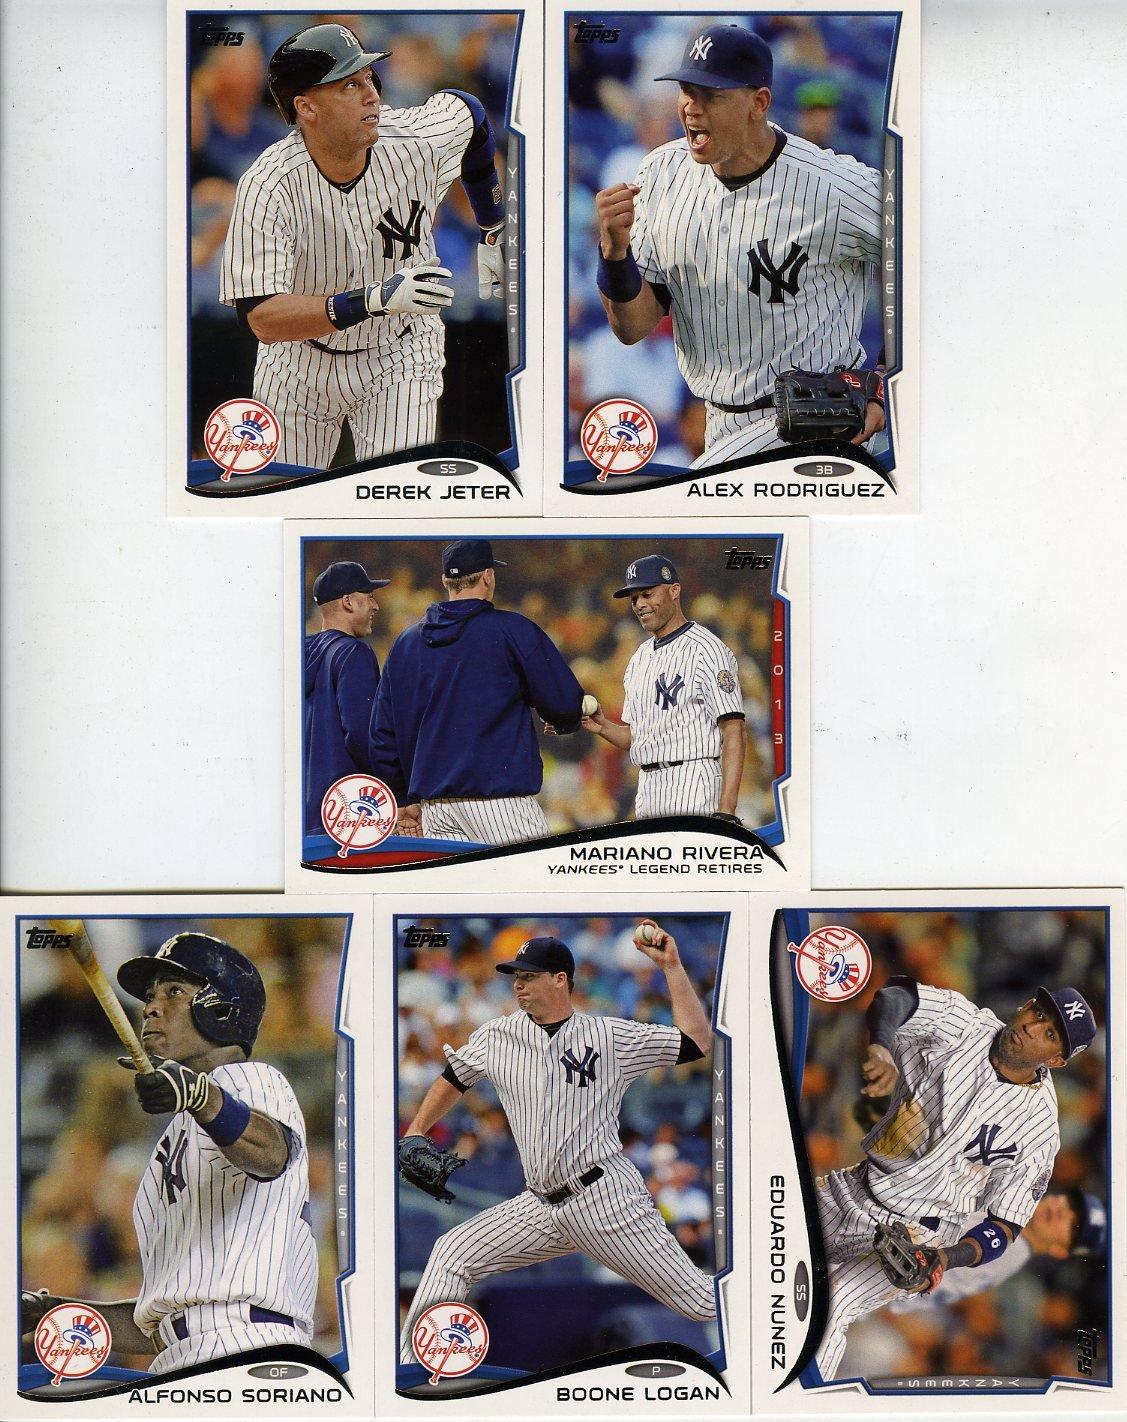 2014 Topps Baseball Cards - New York Yankees - Team Set (Series 1)